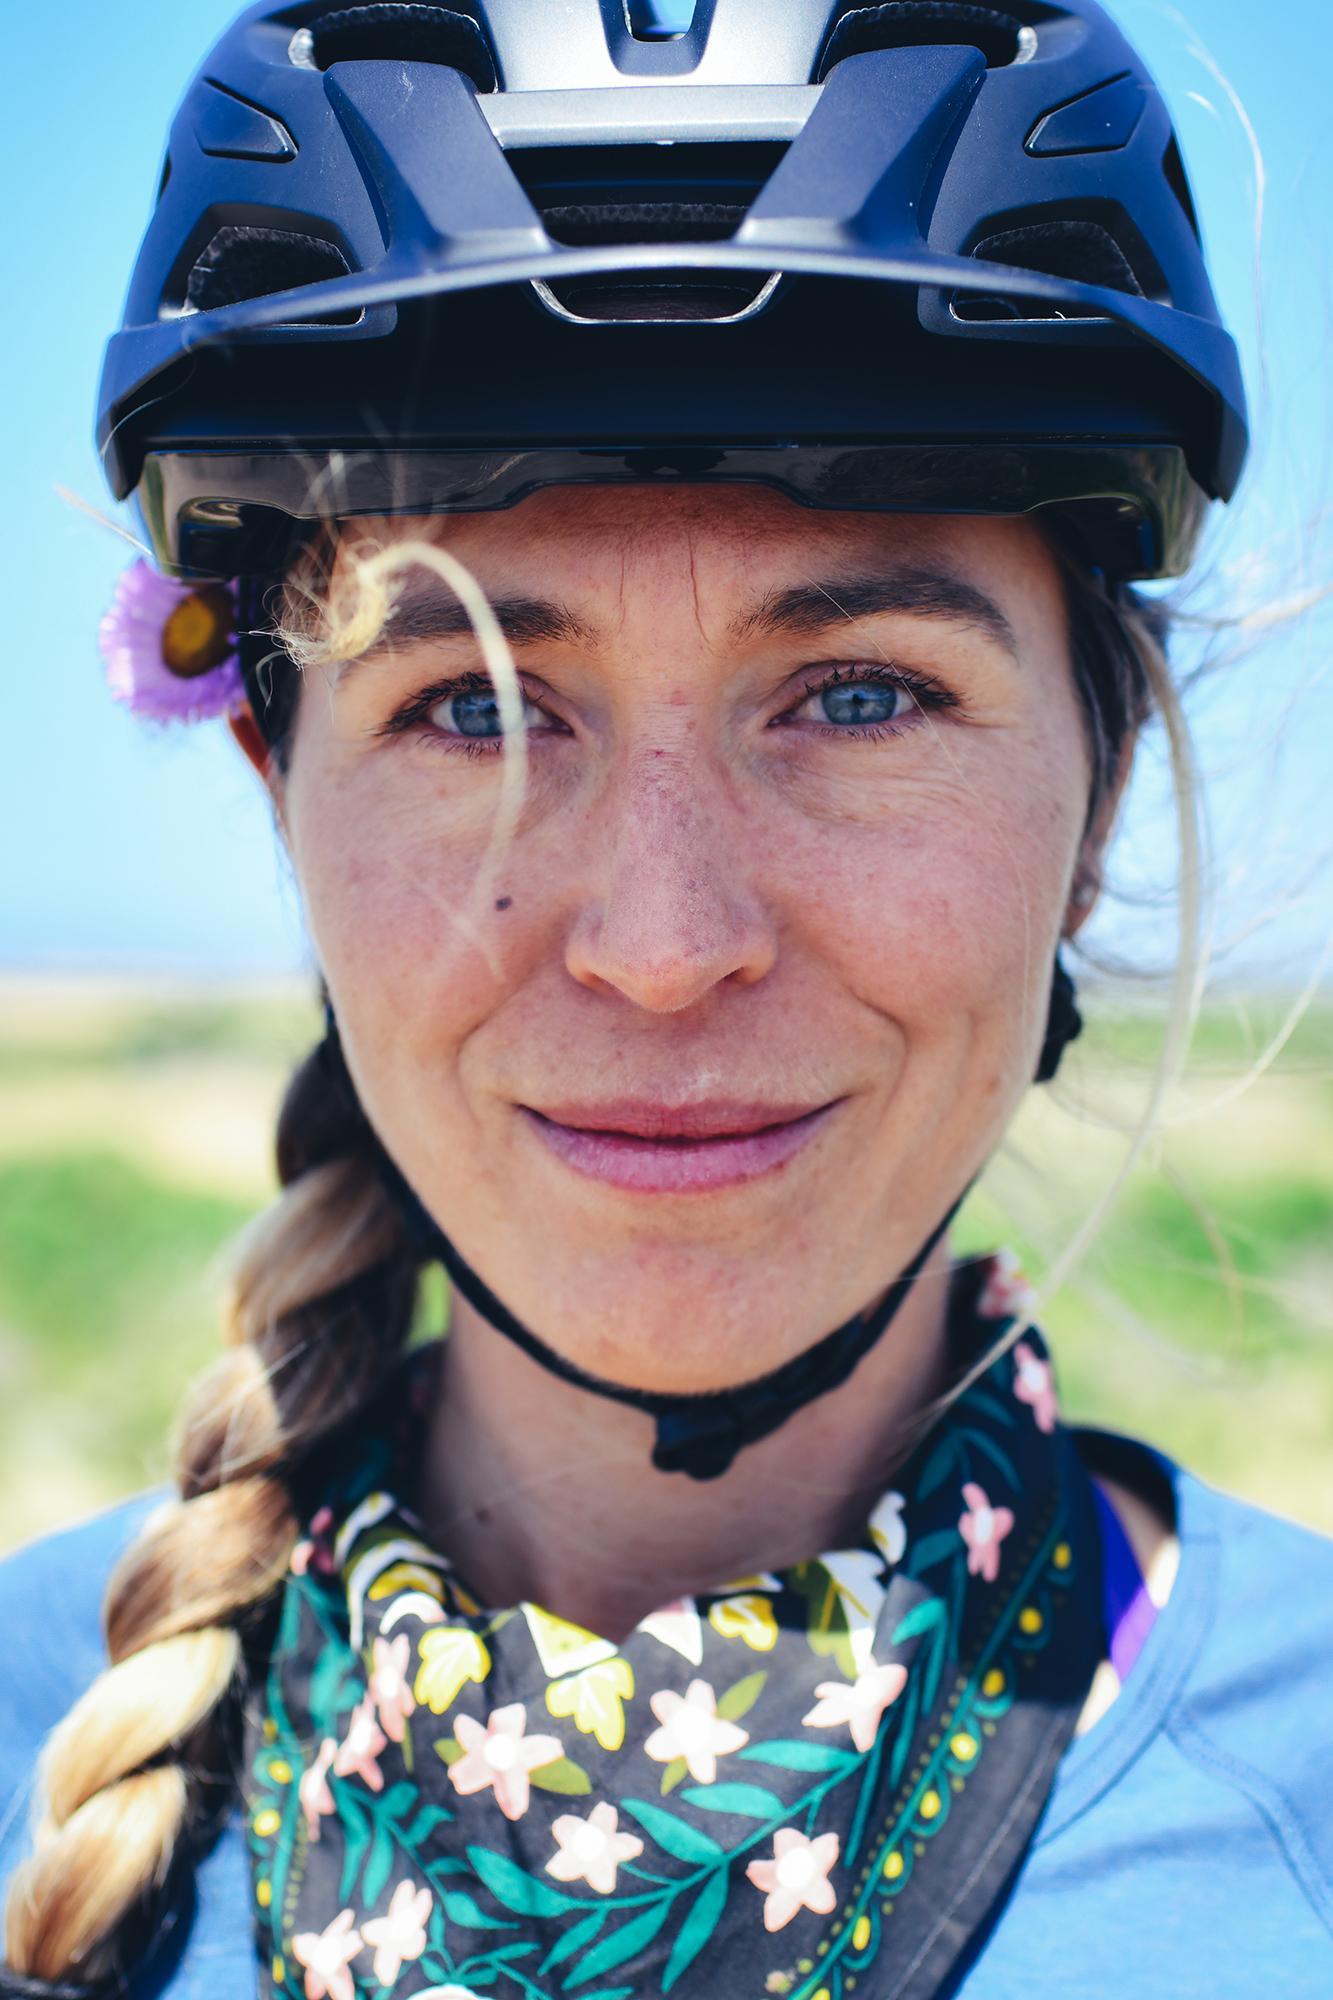 Amanda'sCustom Flashpoint MVMNT Canyon Grizl Gravel Bike